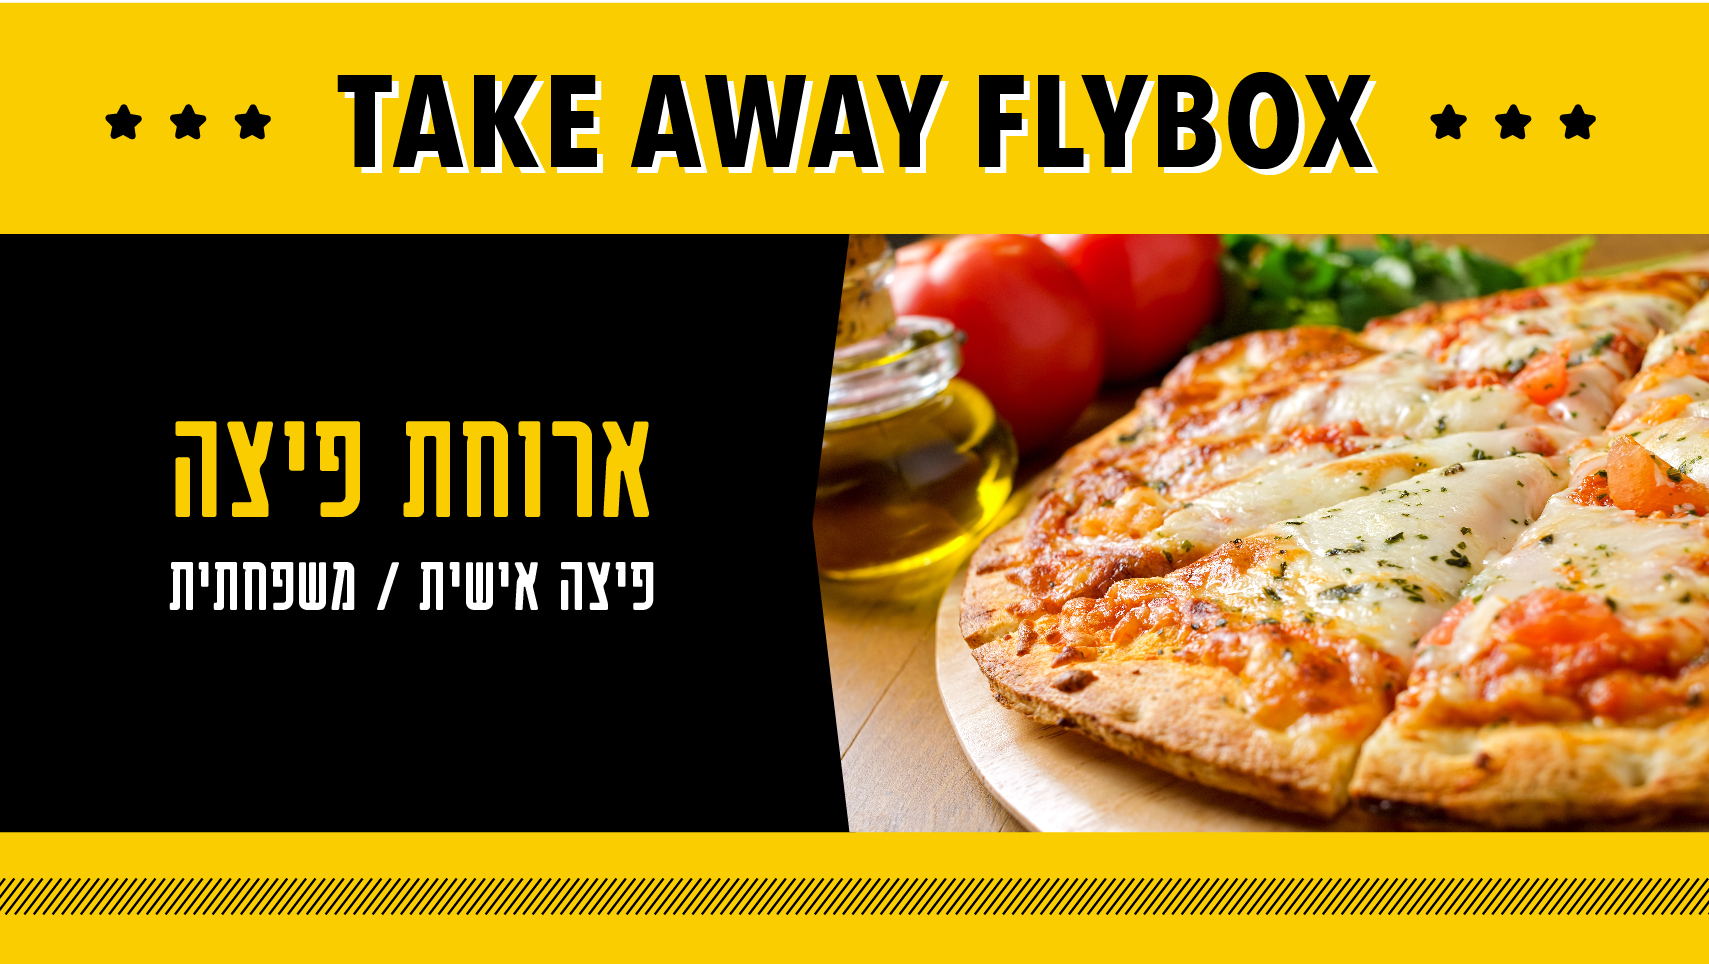 flybox_TAKEAWAY_PIZZA-01